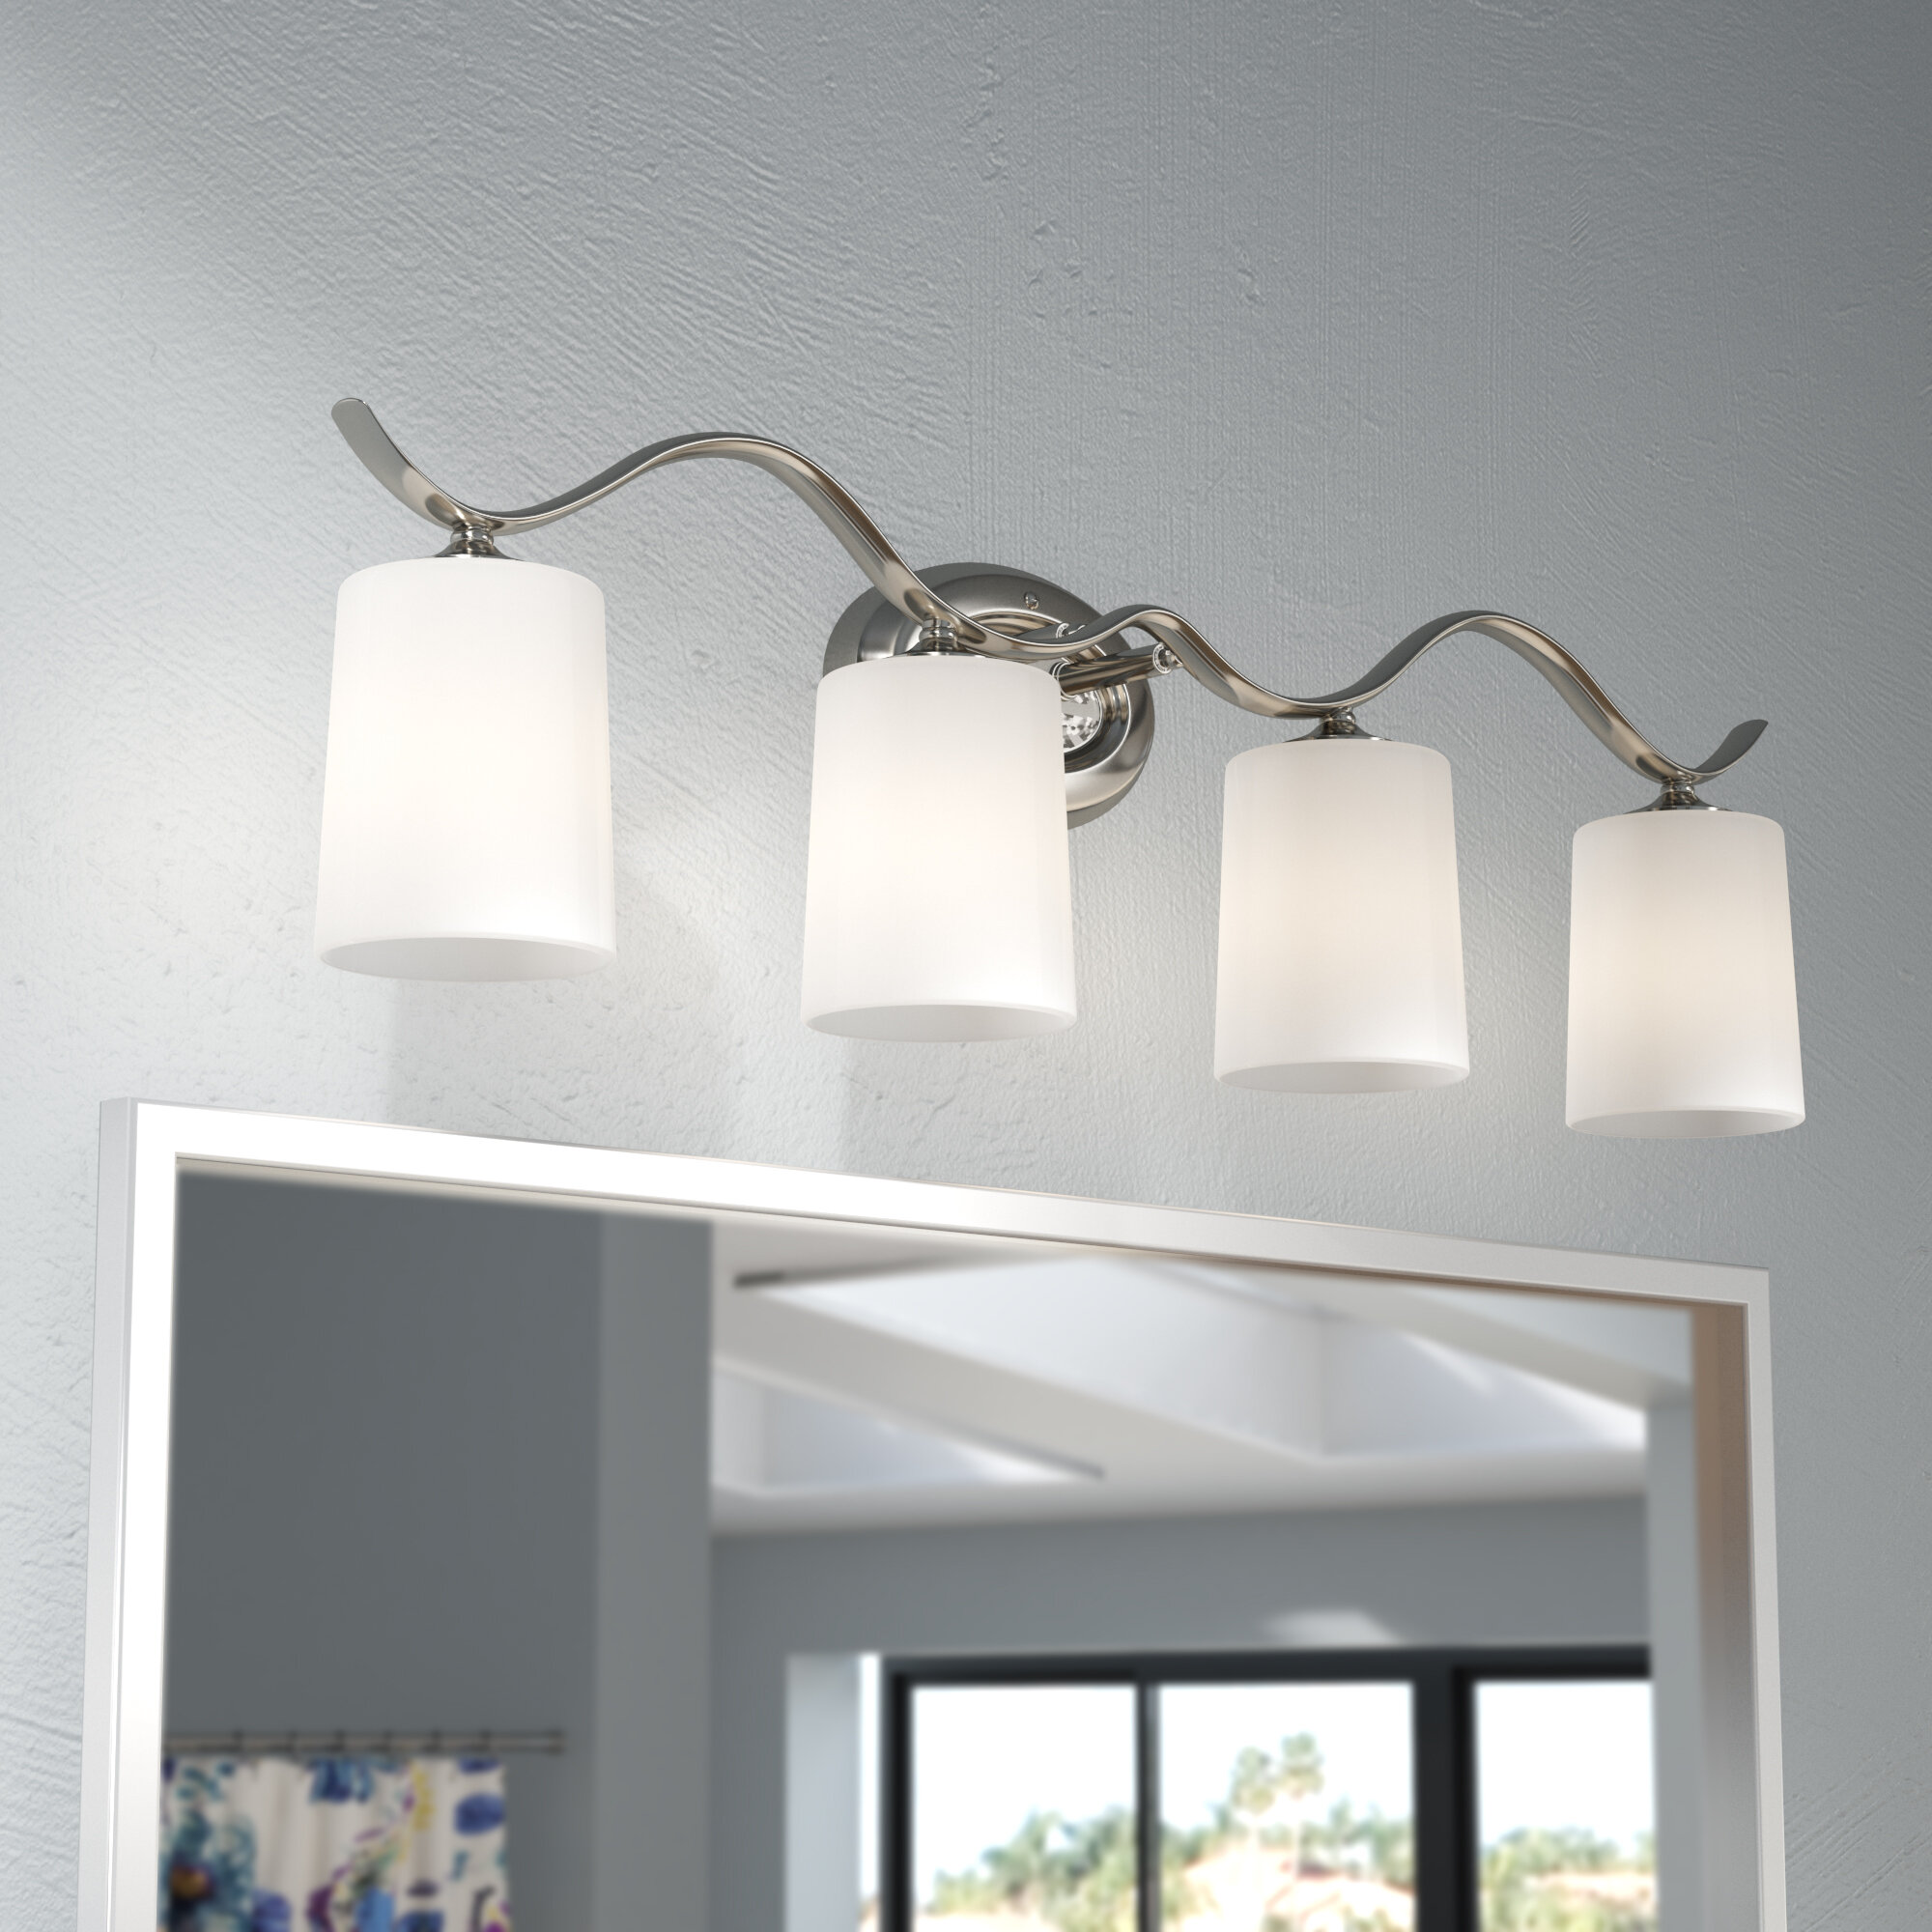 Winston porter sheffield 4 light vanity light reviews wayfair